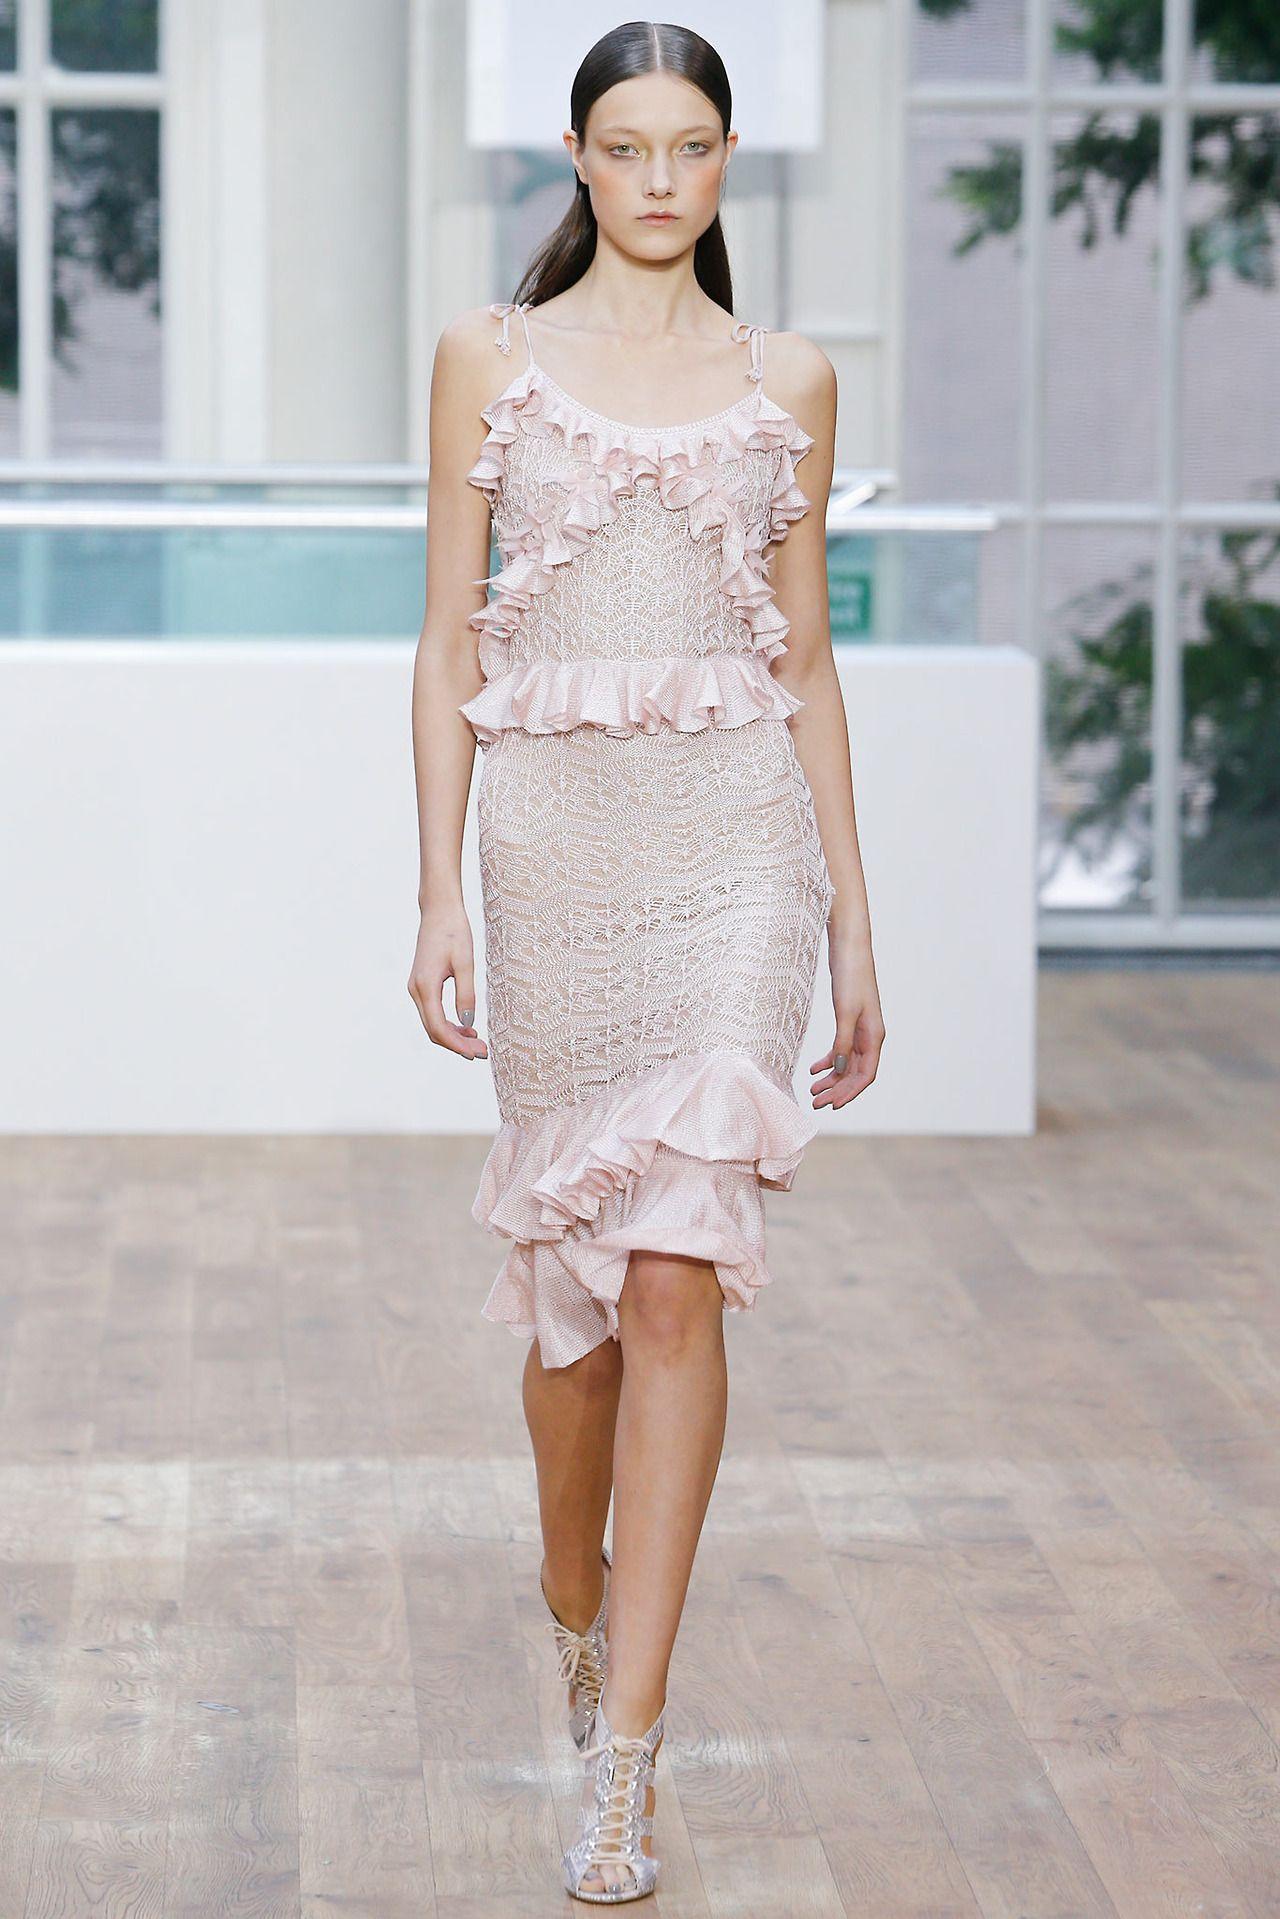 Julien Macdonald Primavera/Verano 2015 Semana de la Moda de Londres ….. Julien Macdonald Spring/Summer 2015 London Fashion Week